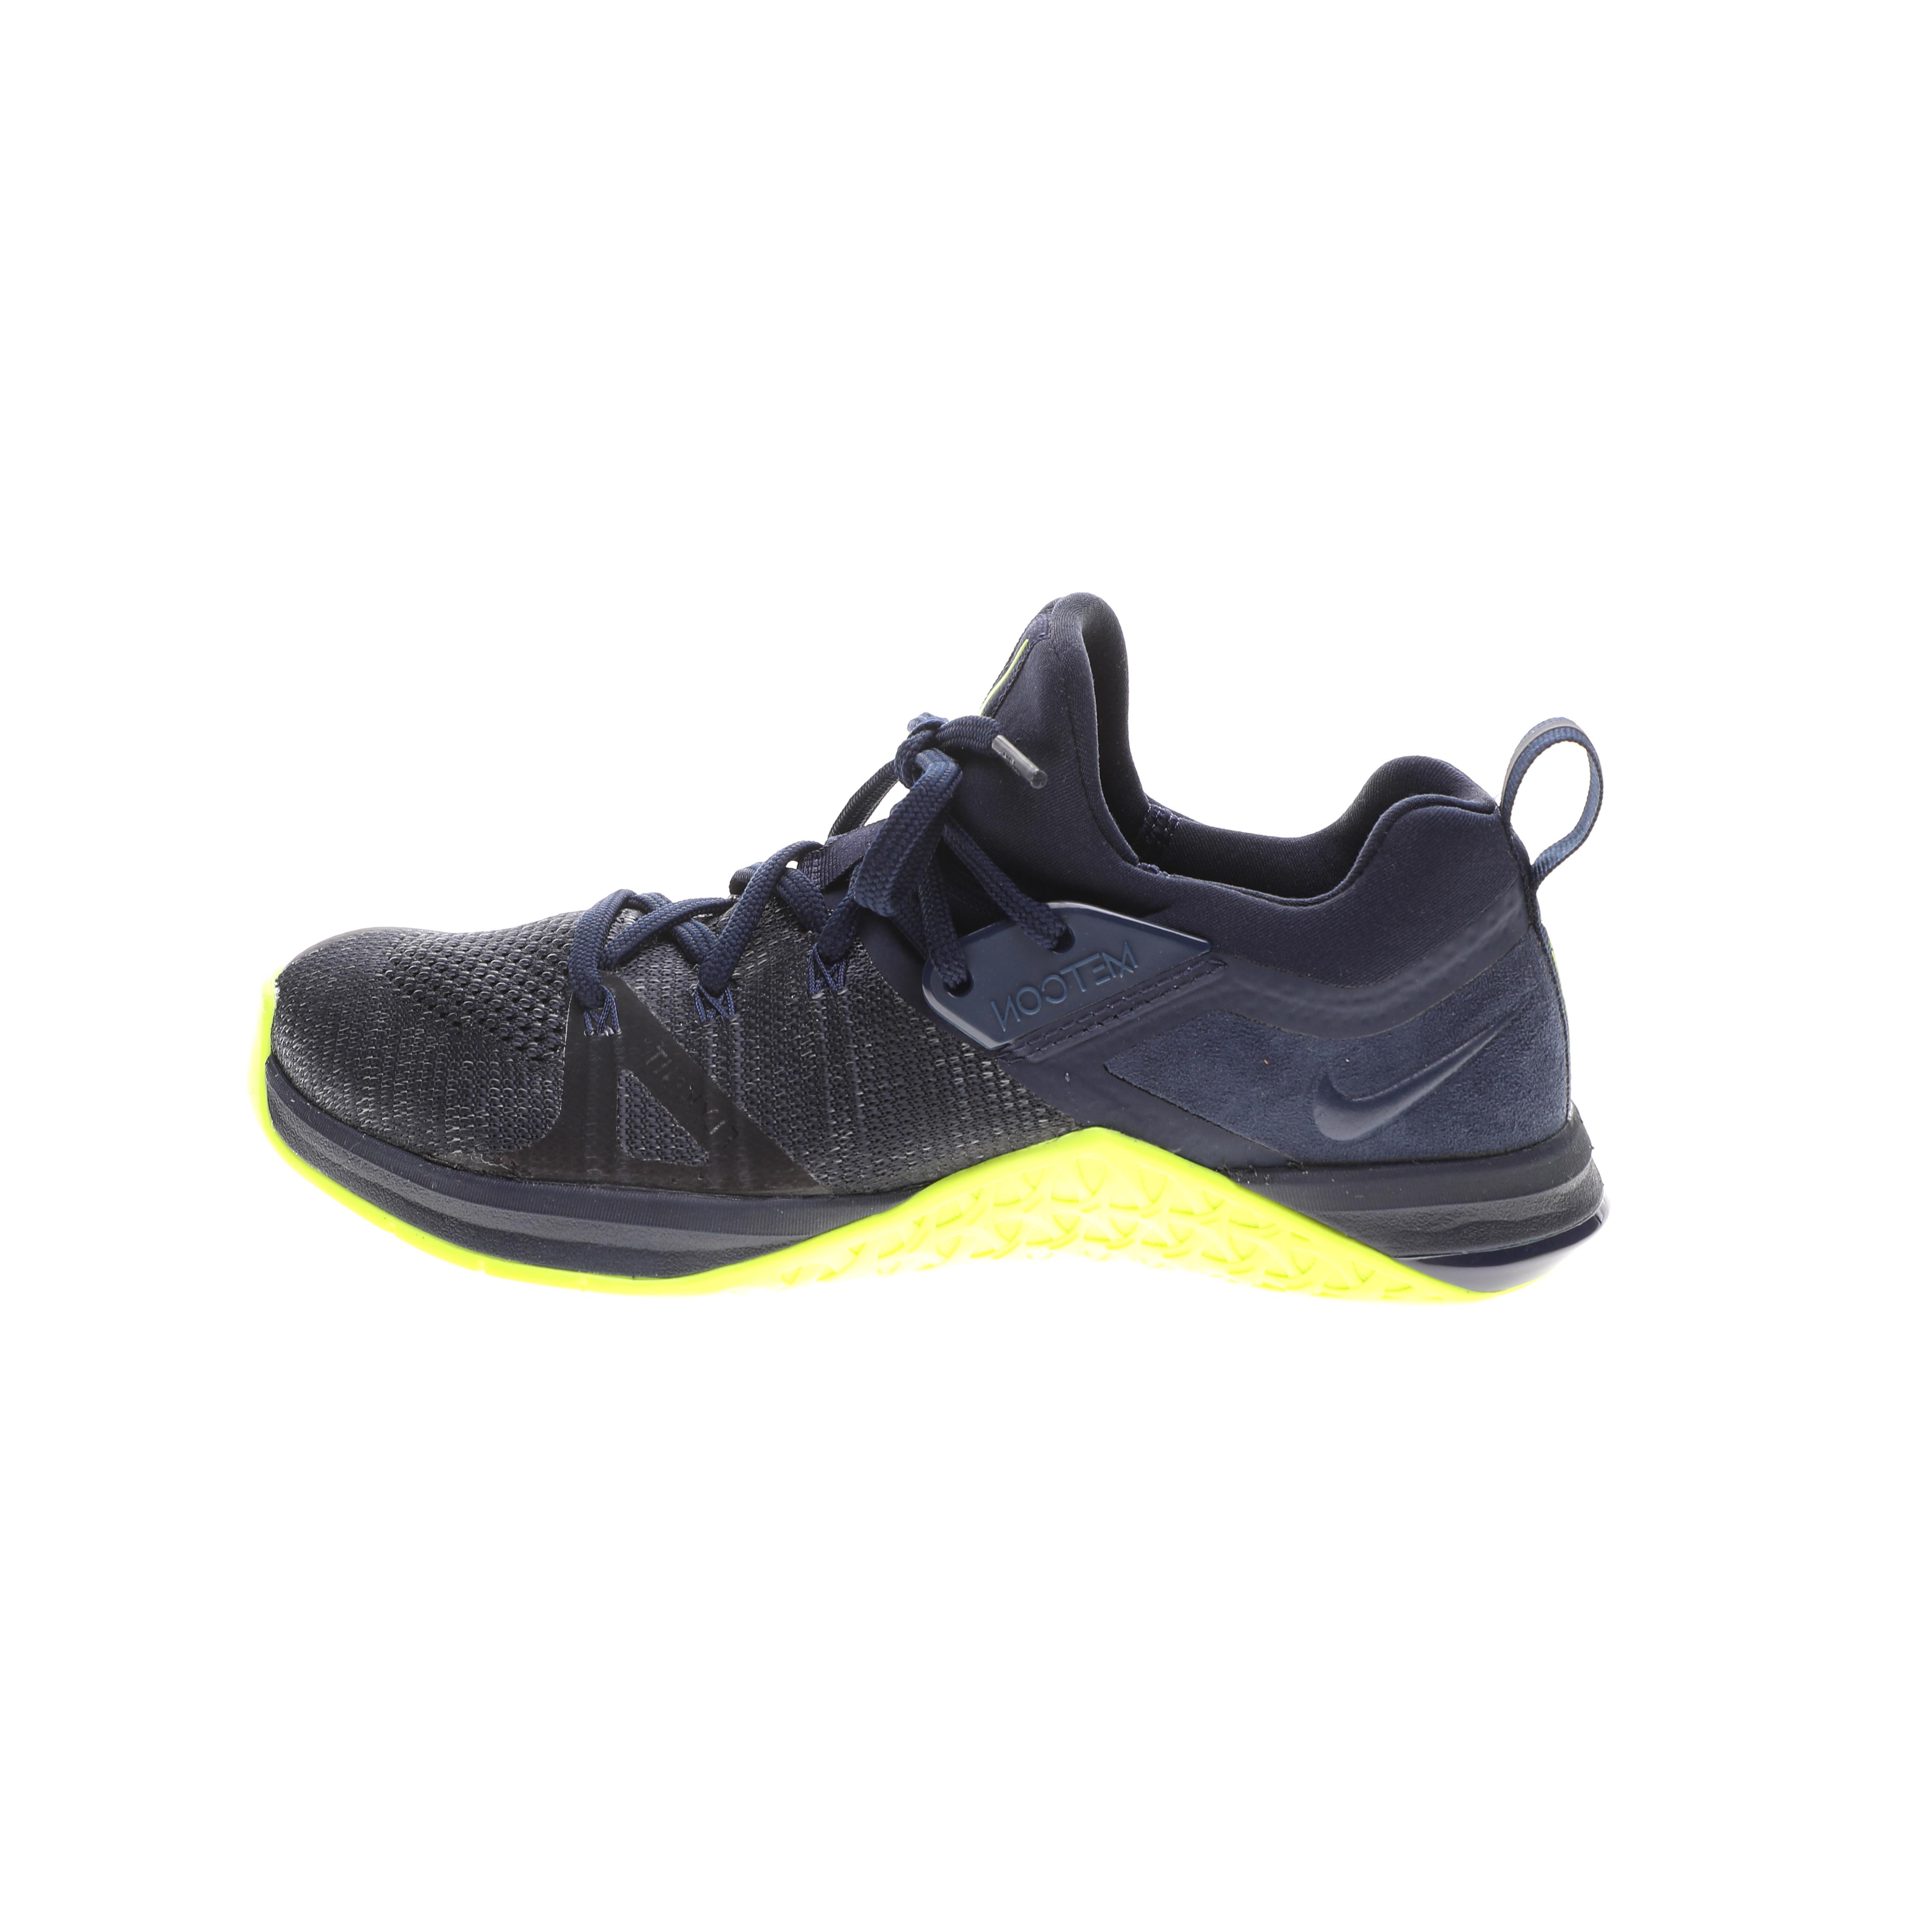 NIKE – Ανδρικά παπούτσια NIKE METCON FLYKNIT 3 μαύρα